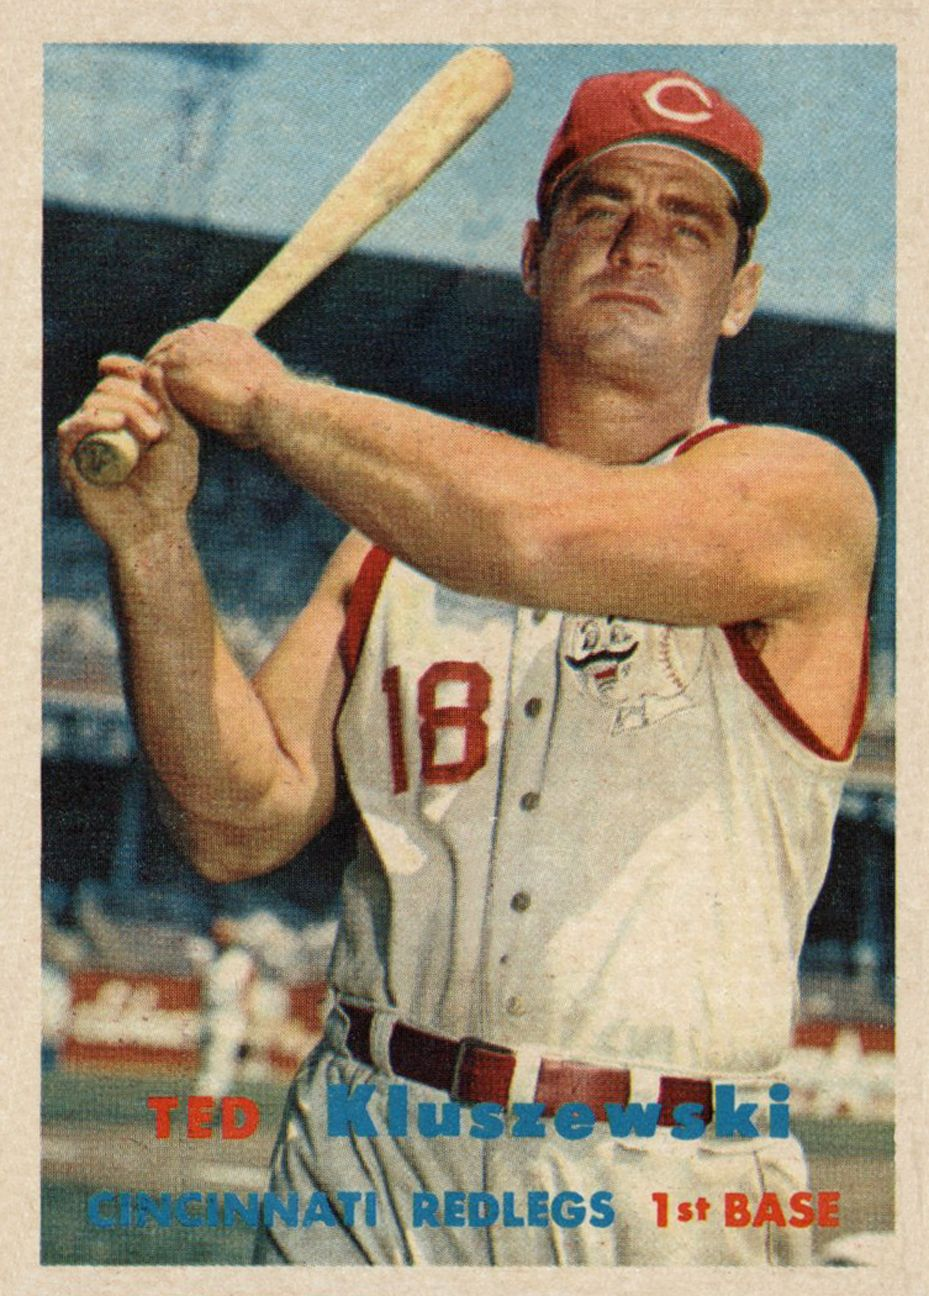 1957 Topps Ted Kluszewski Baseball cards, Baseball card